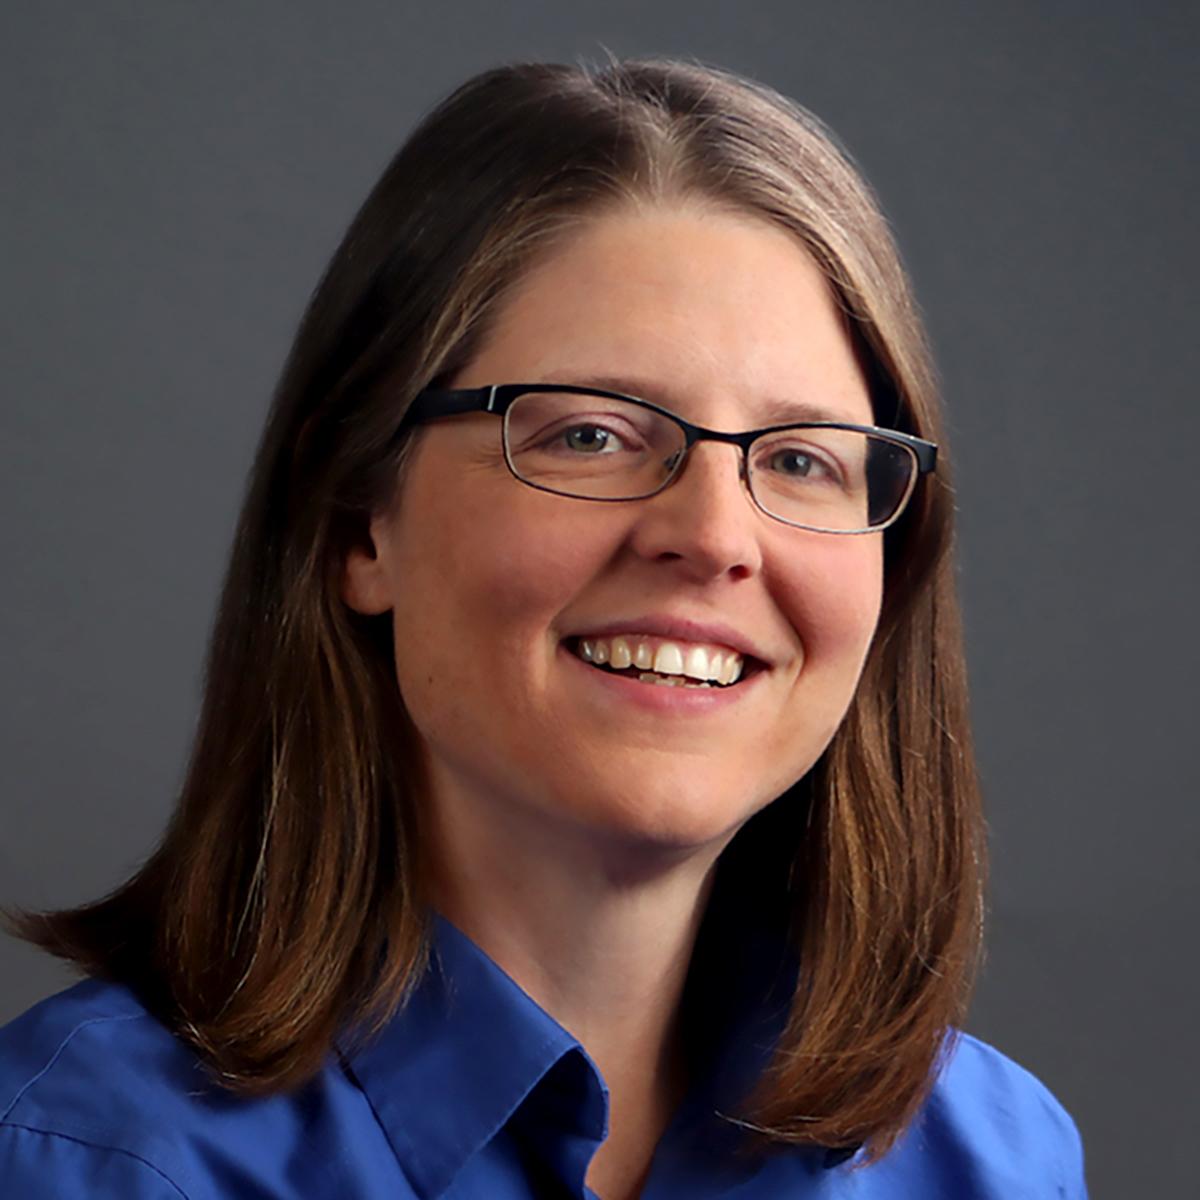 Profile picture of Mary Drewnoski